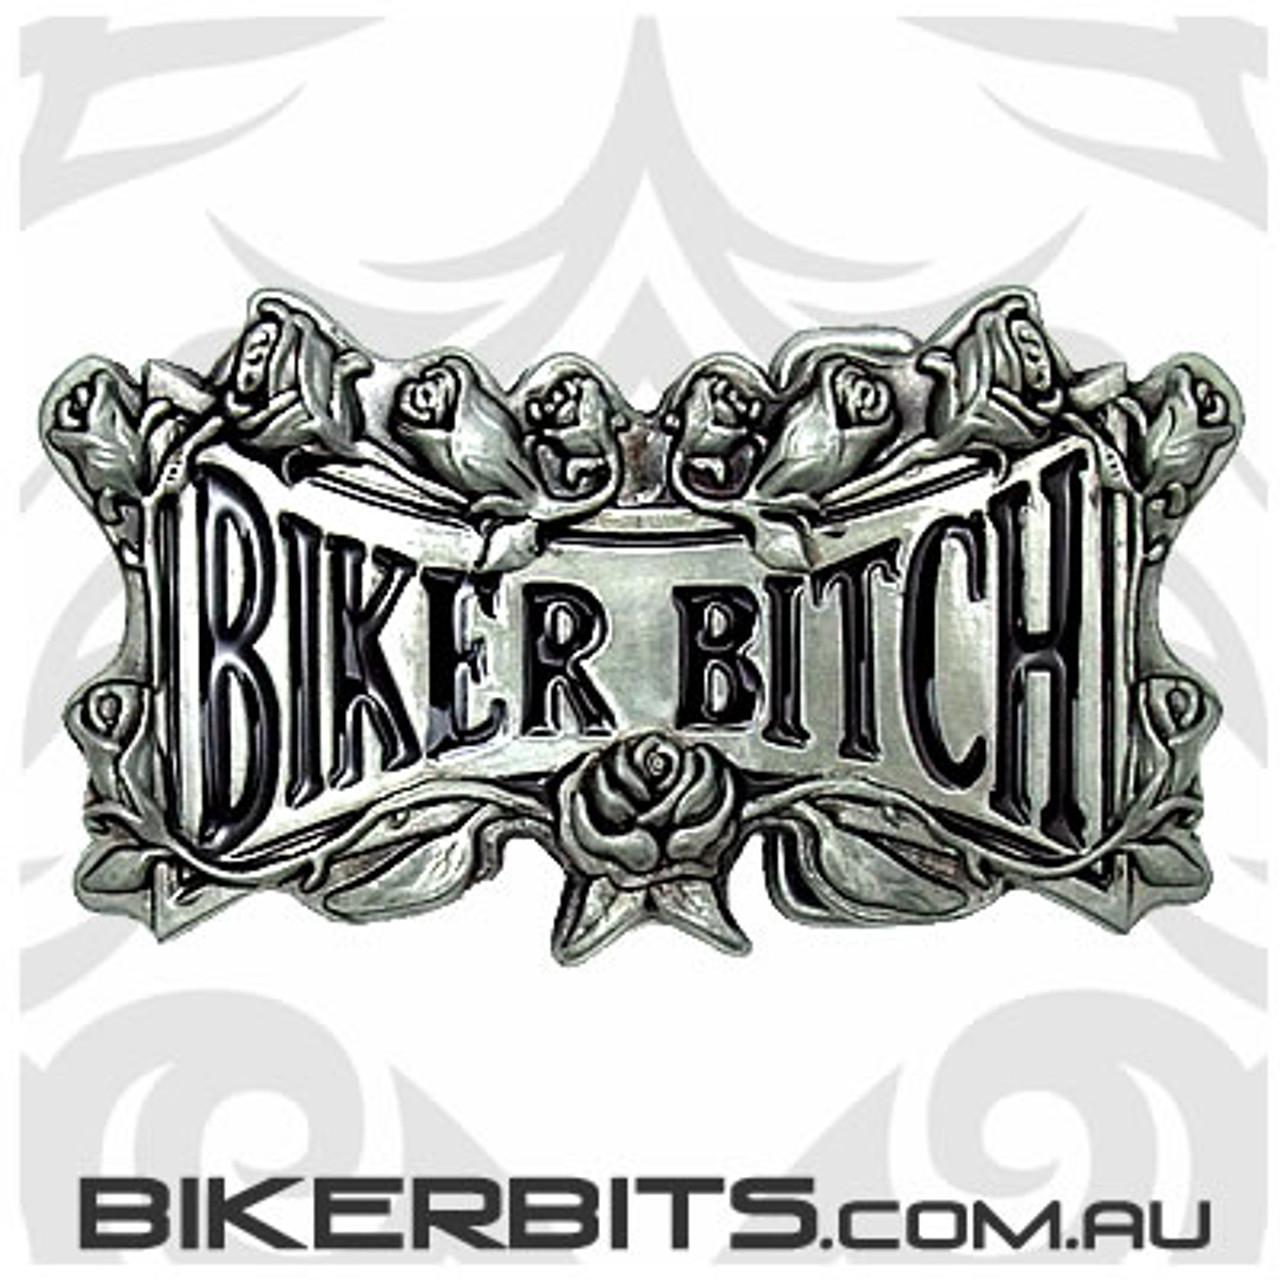 Belt Buckle - Biker Bitch